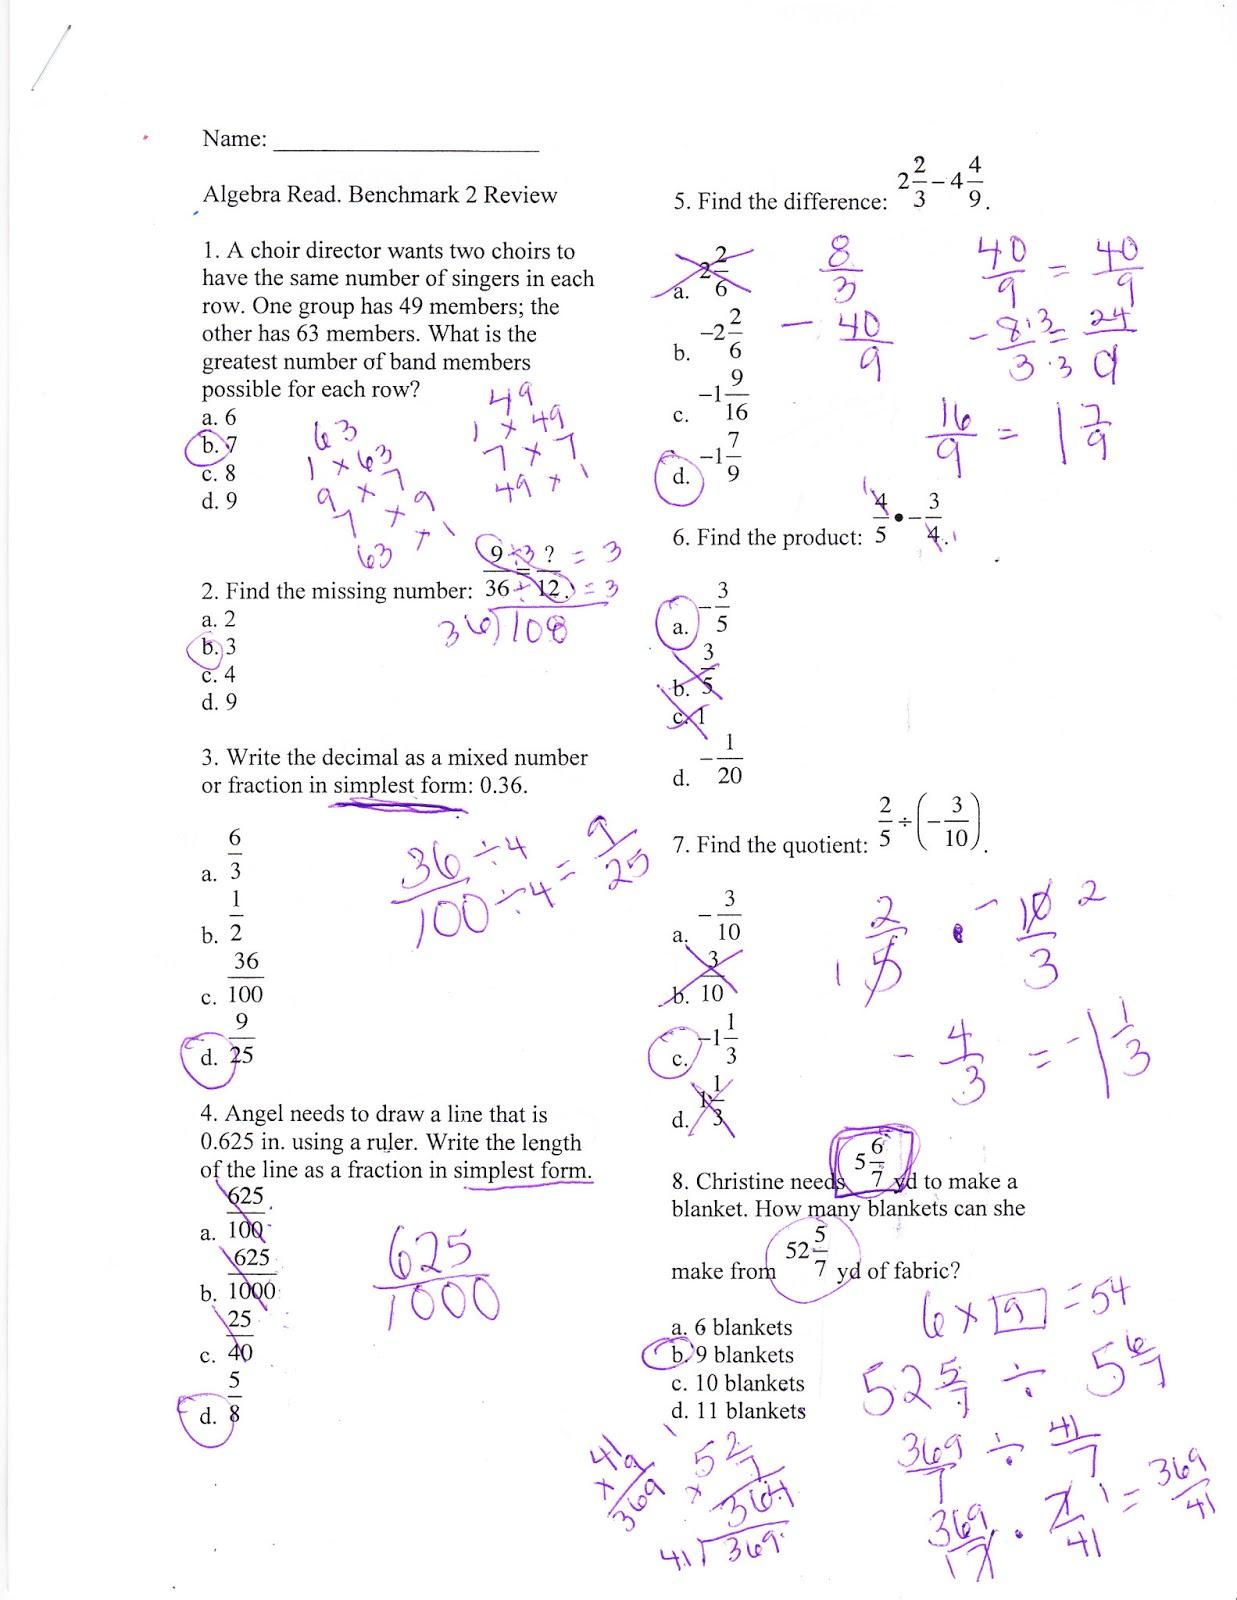 Worksheets Algebra Readiness Worksheets lovely algebra one practice photos worksheet mathematics ideas ms jeans classroom blog readiness benchmark